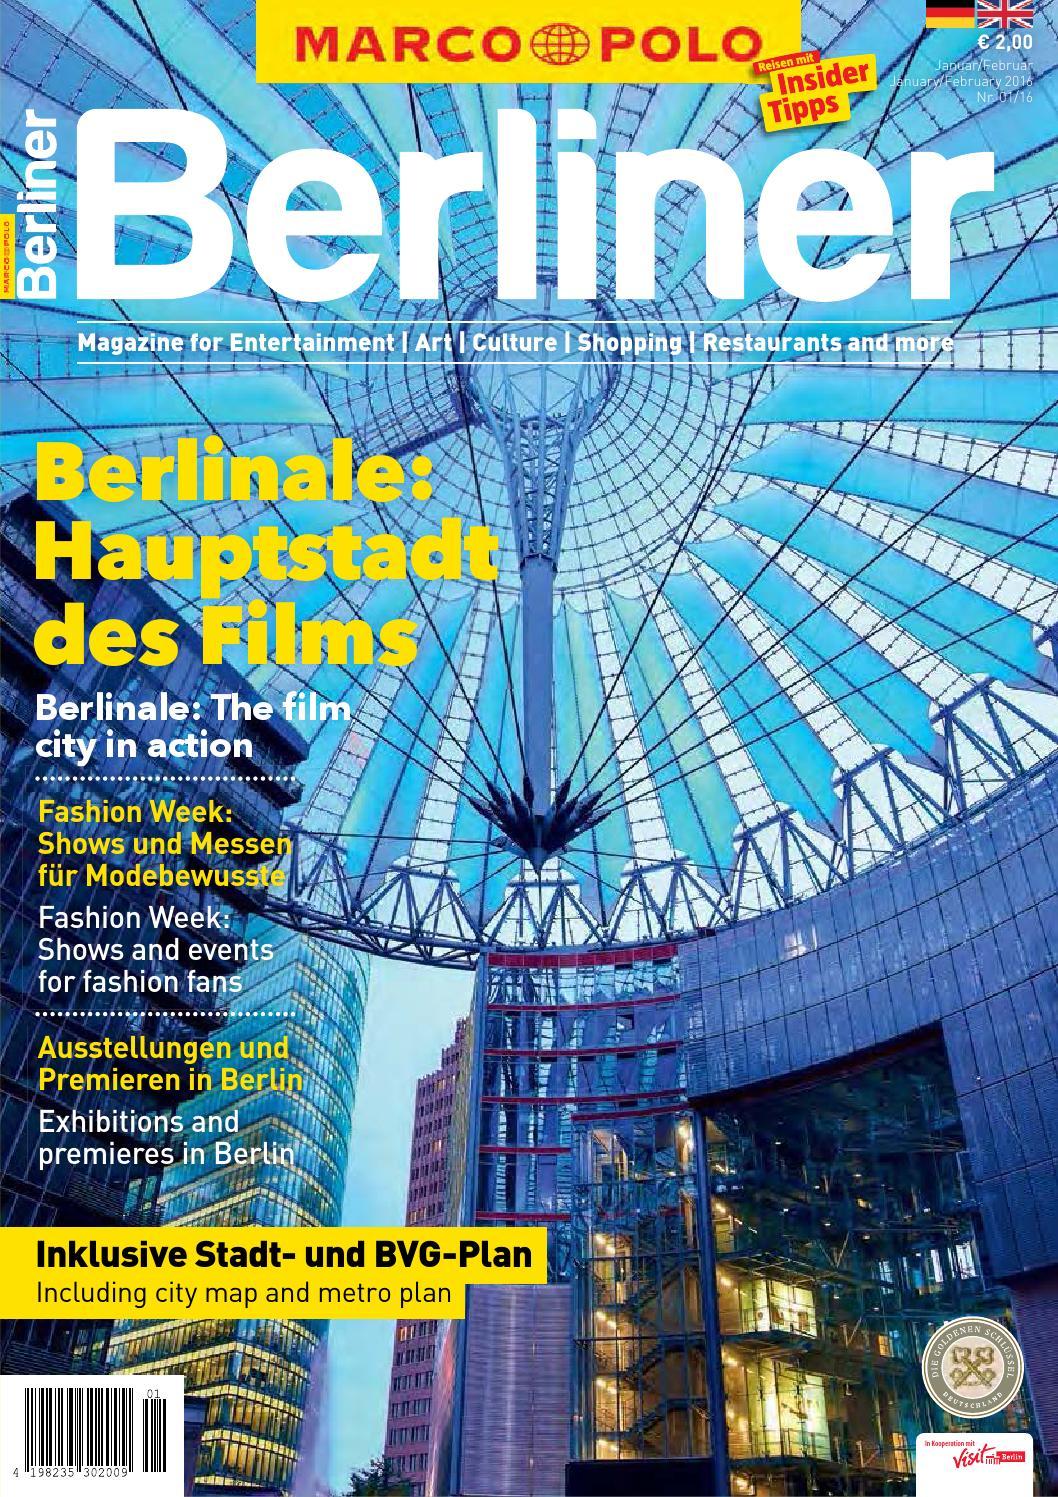 MARCO POLO Berliner 01/16 by Berlin Medien GmbH - issuu